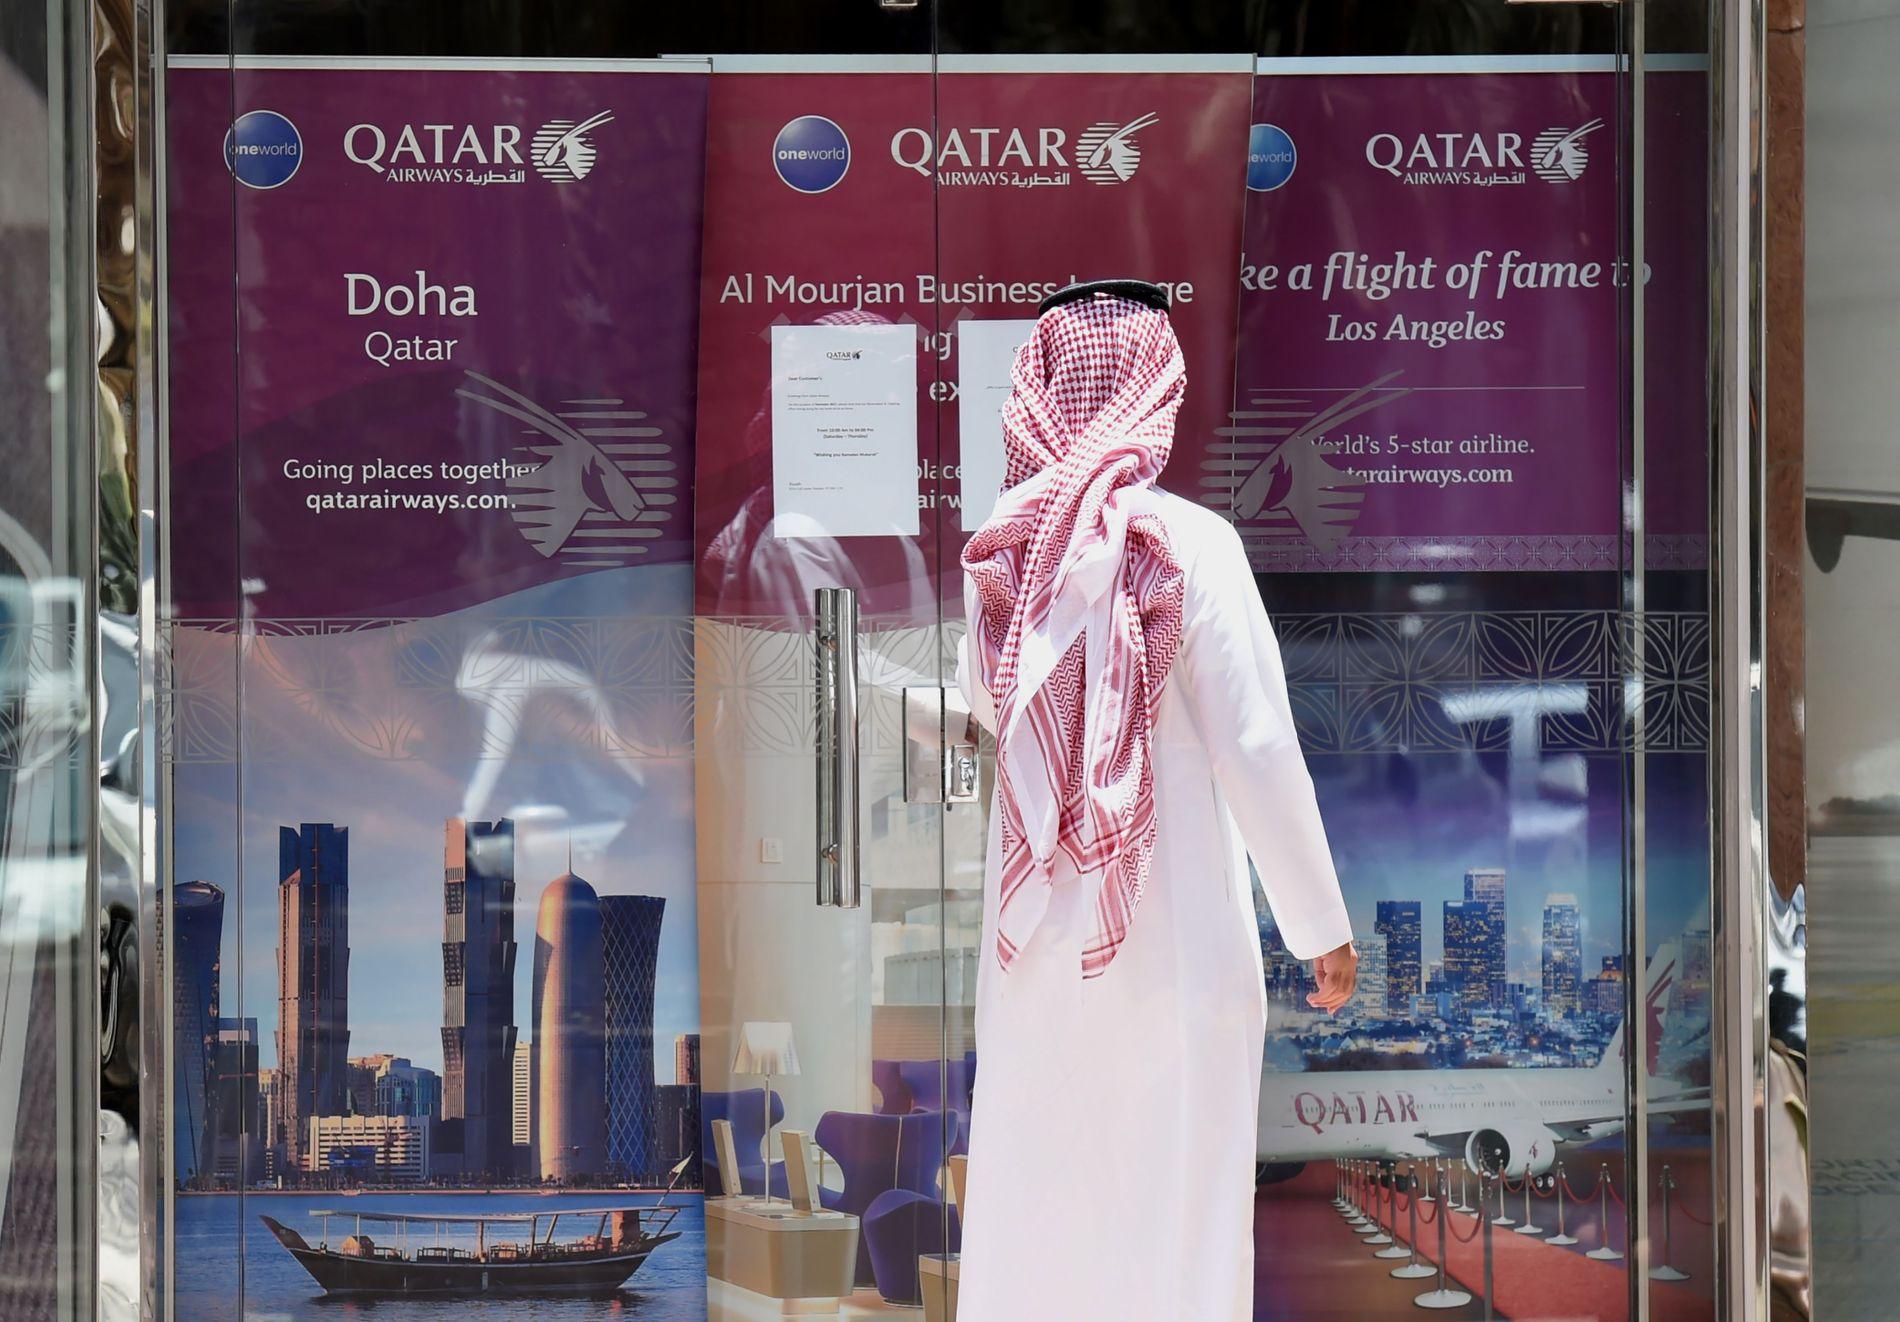 STENGT: En mann i Riyad, hovedstaden i Saudi-Arabia, betrakter det stengte kontoret til Qatar Airways.